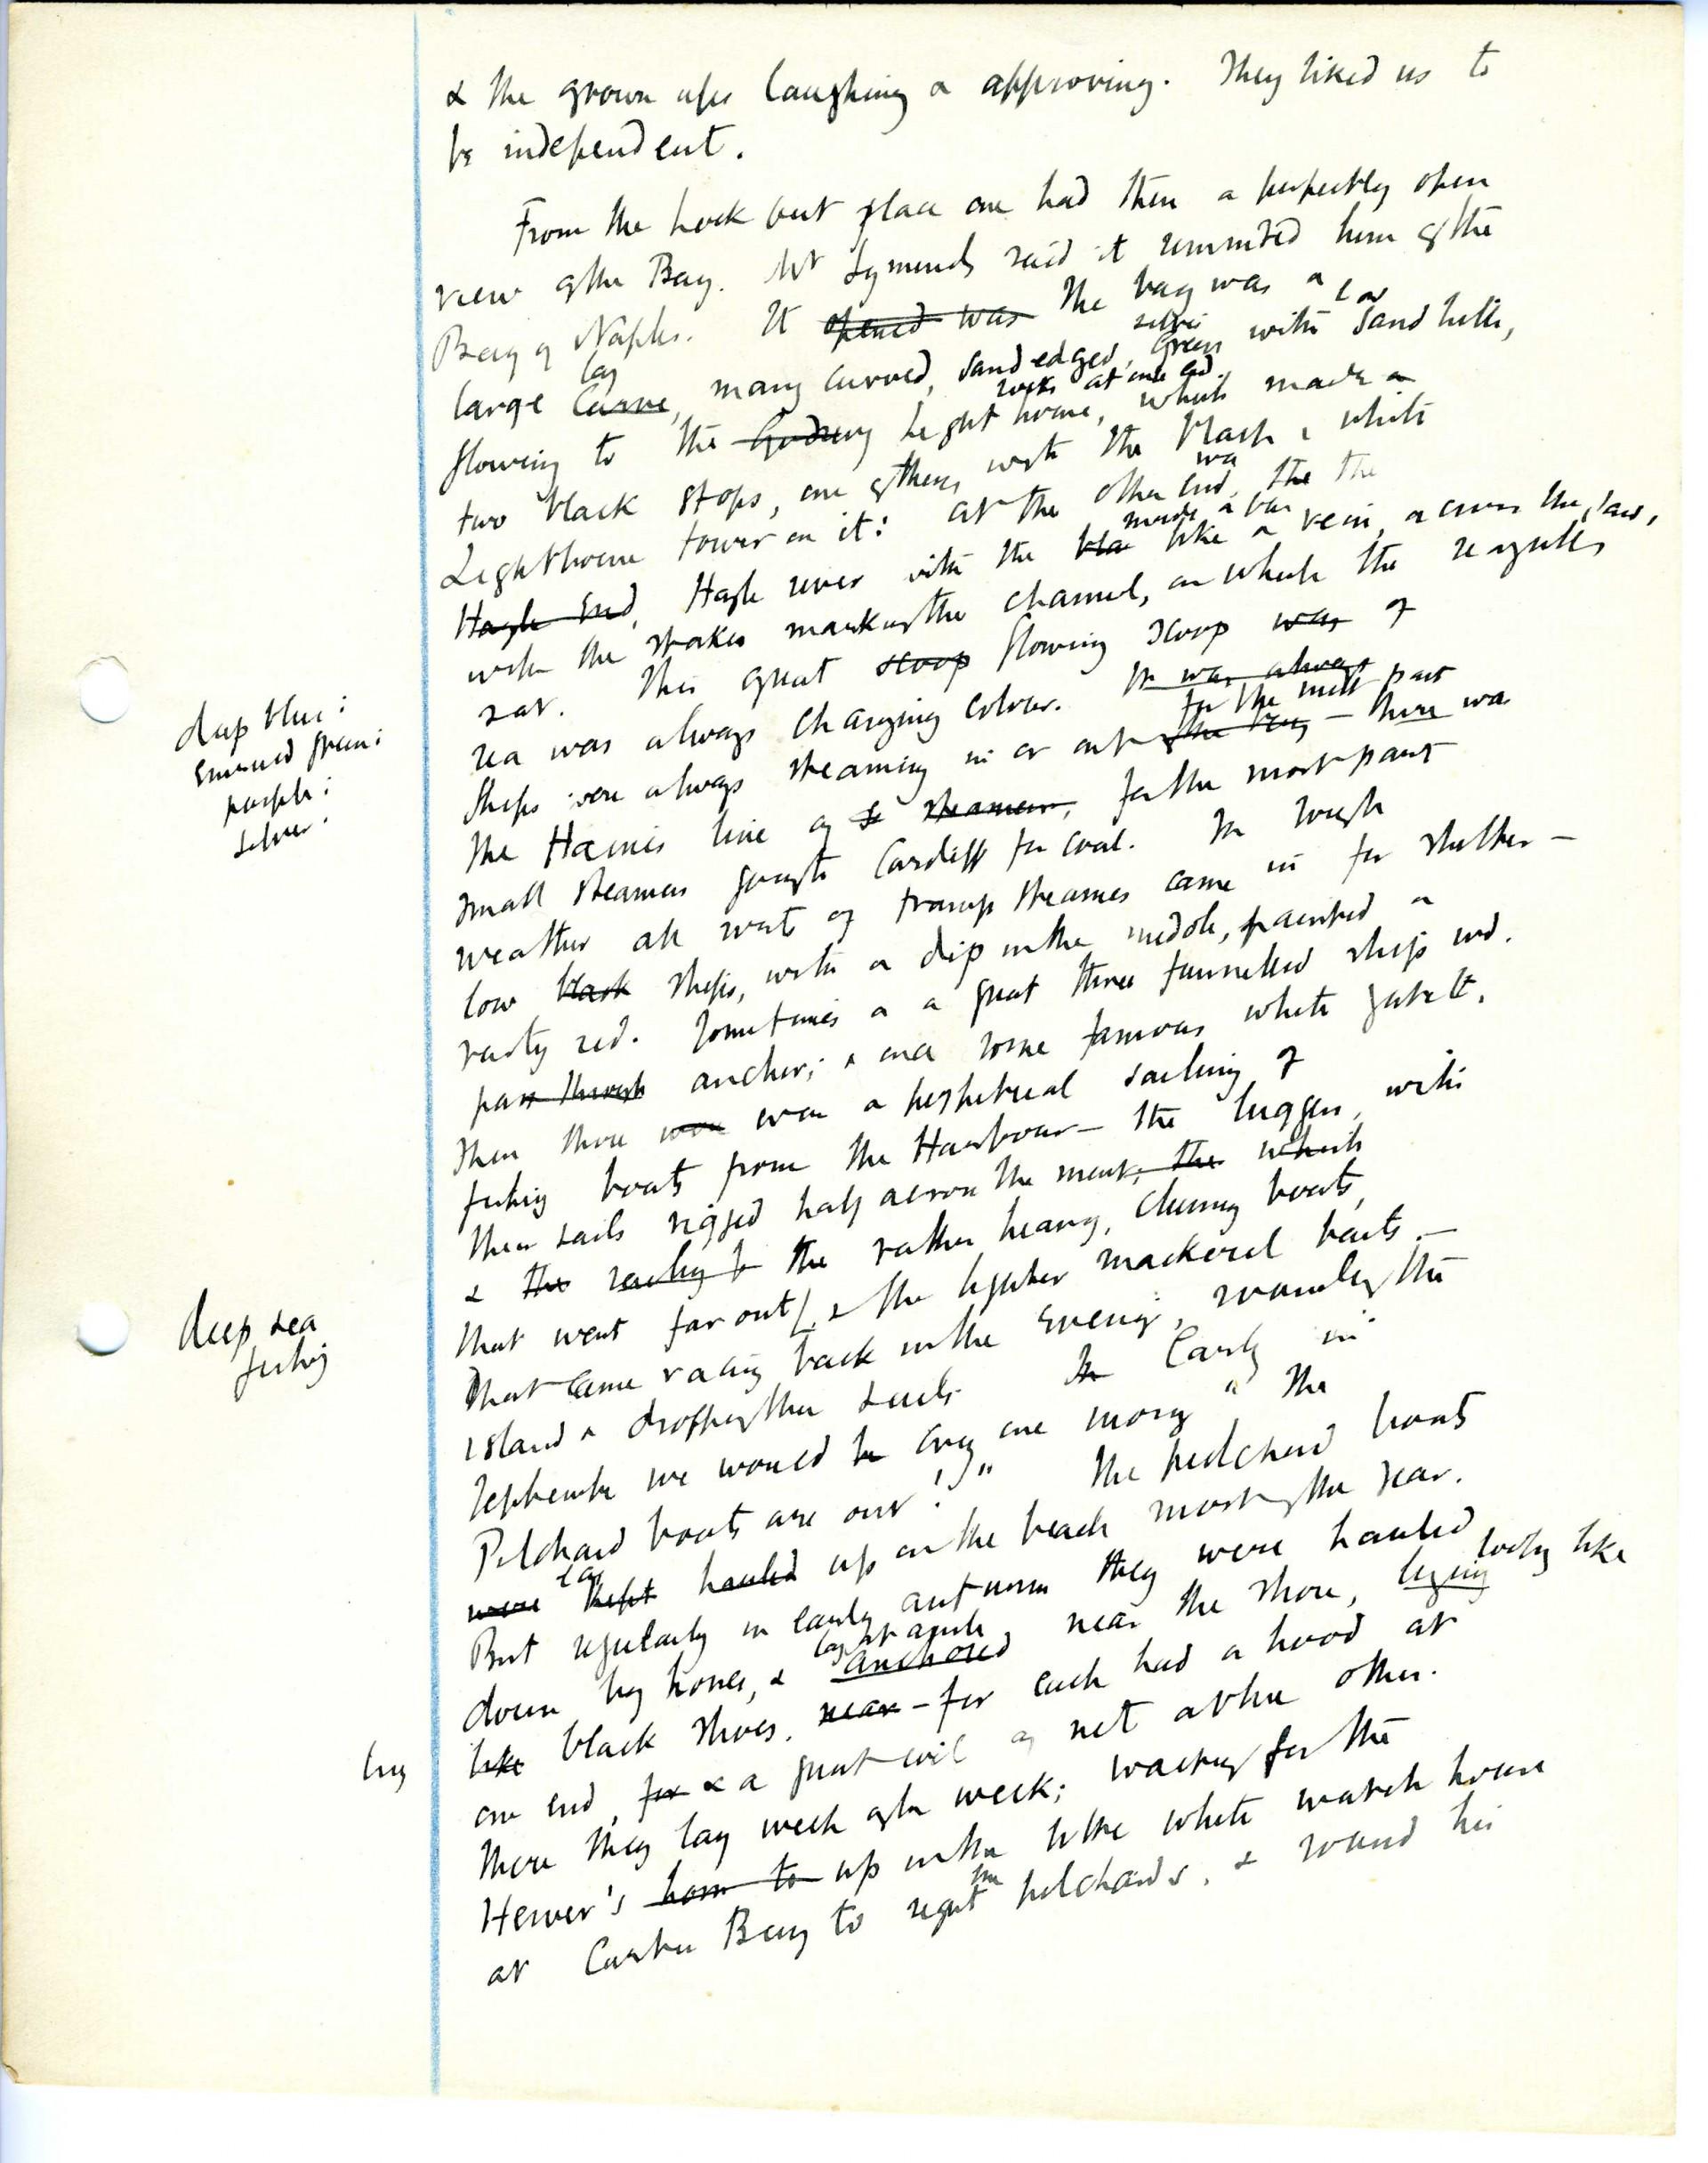 012 Essay Example Virginia Woolf Unusual Essays Online The Modern Analysis On Self 1920